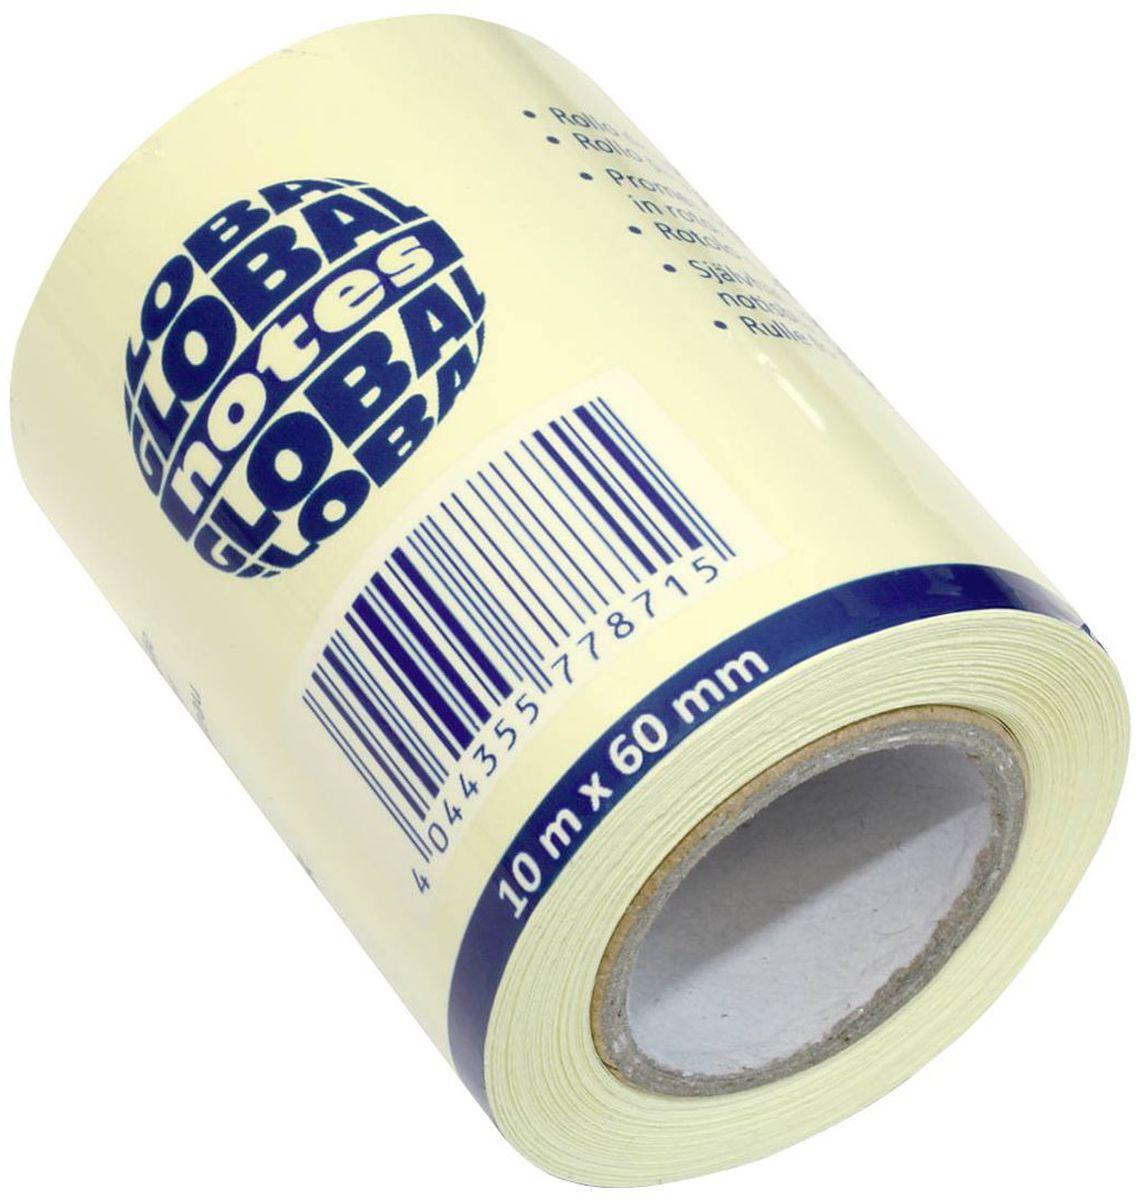 Global Notes Бумага для заметок с липким слоем цвет желтый 60 мм х 10 м 362001 бумага для заметок с липким слоем 76х76 мм розовая пастель 450 л